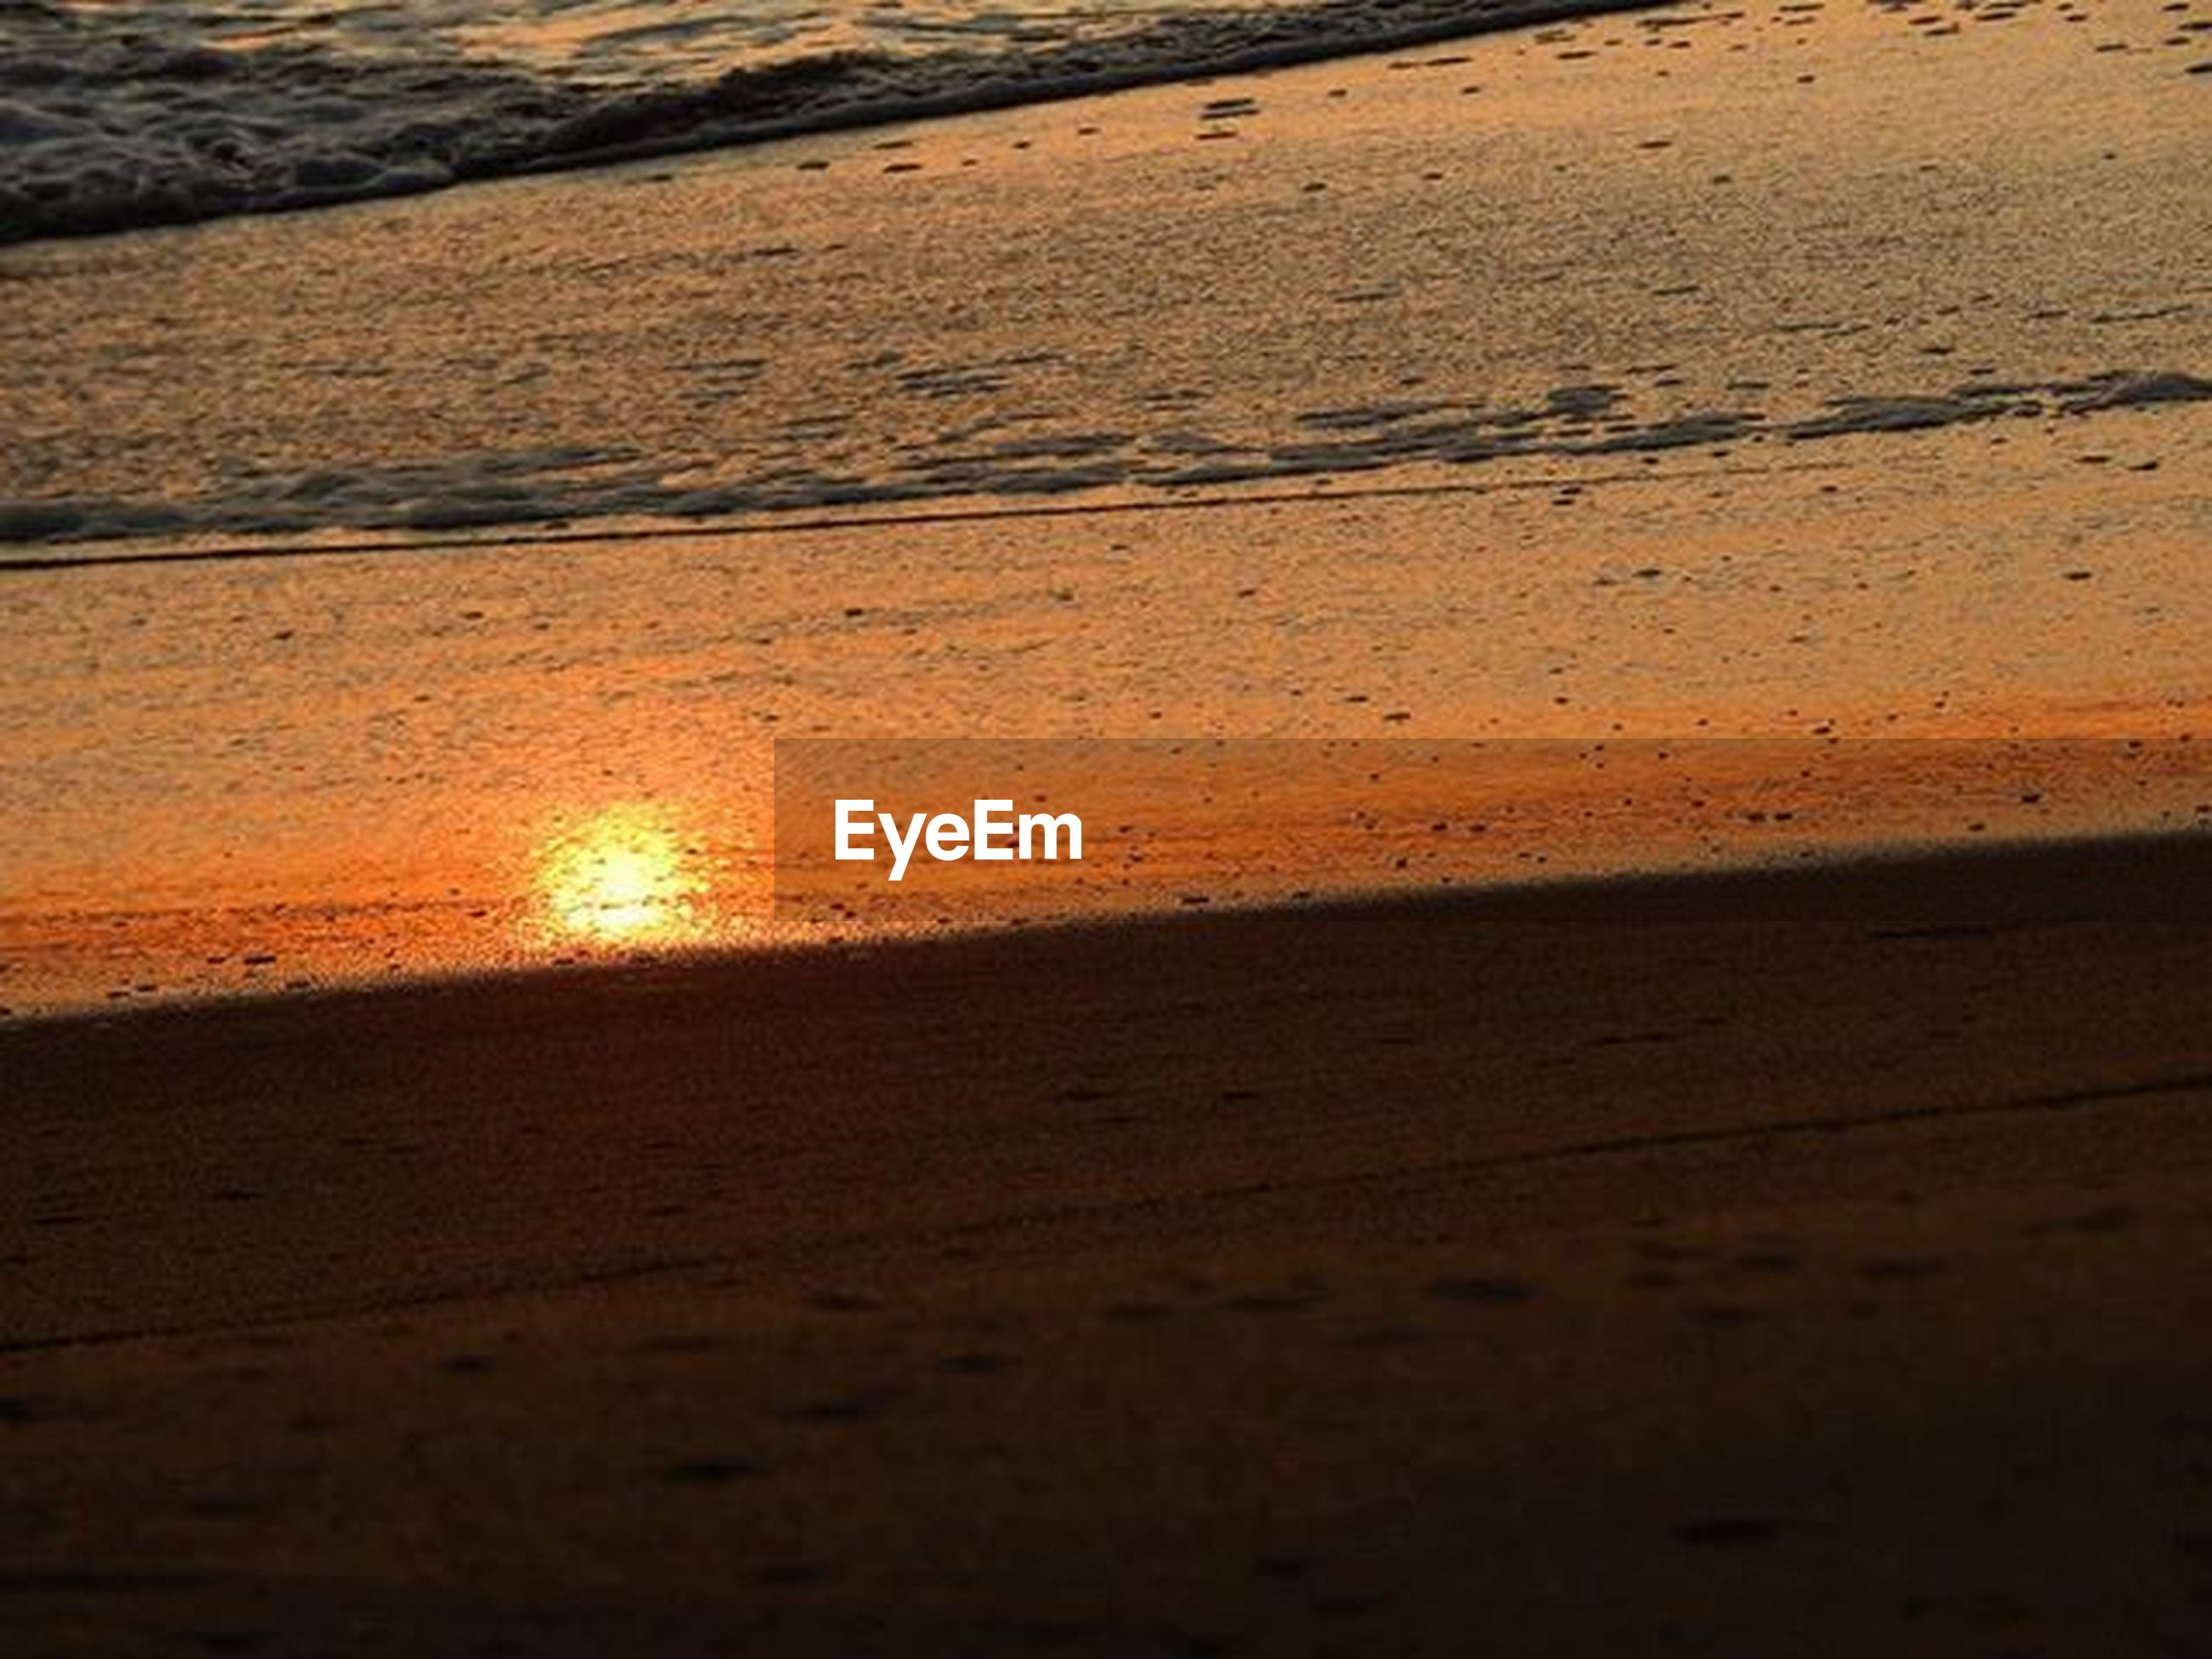 beach, sunset, sea, water, sand, shore, tranquility, tranquil scene, scenics, beauty in nature, sun, horizon over water, nature, sunlight, idyllic, reflection, orange color, coastline, sky, wave